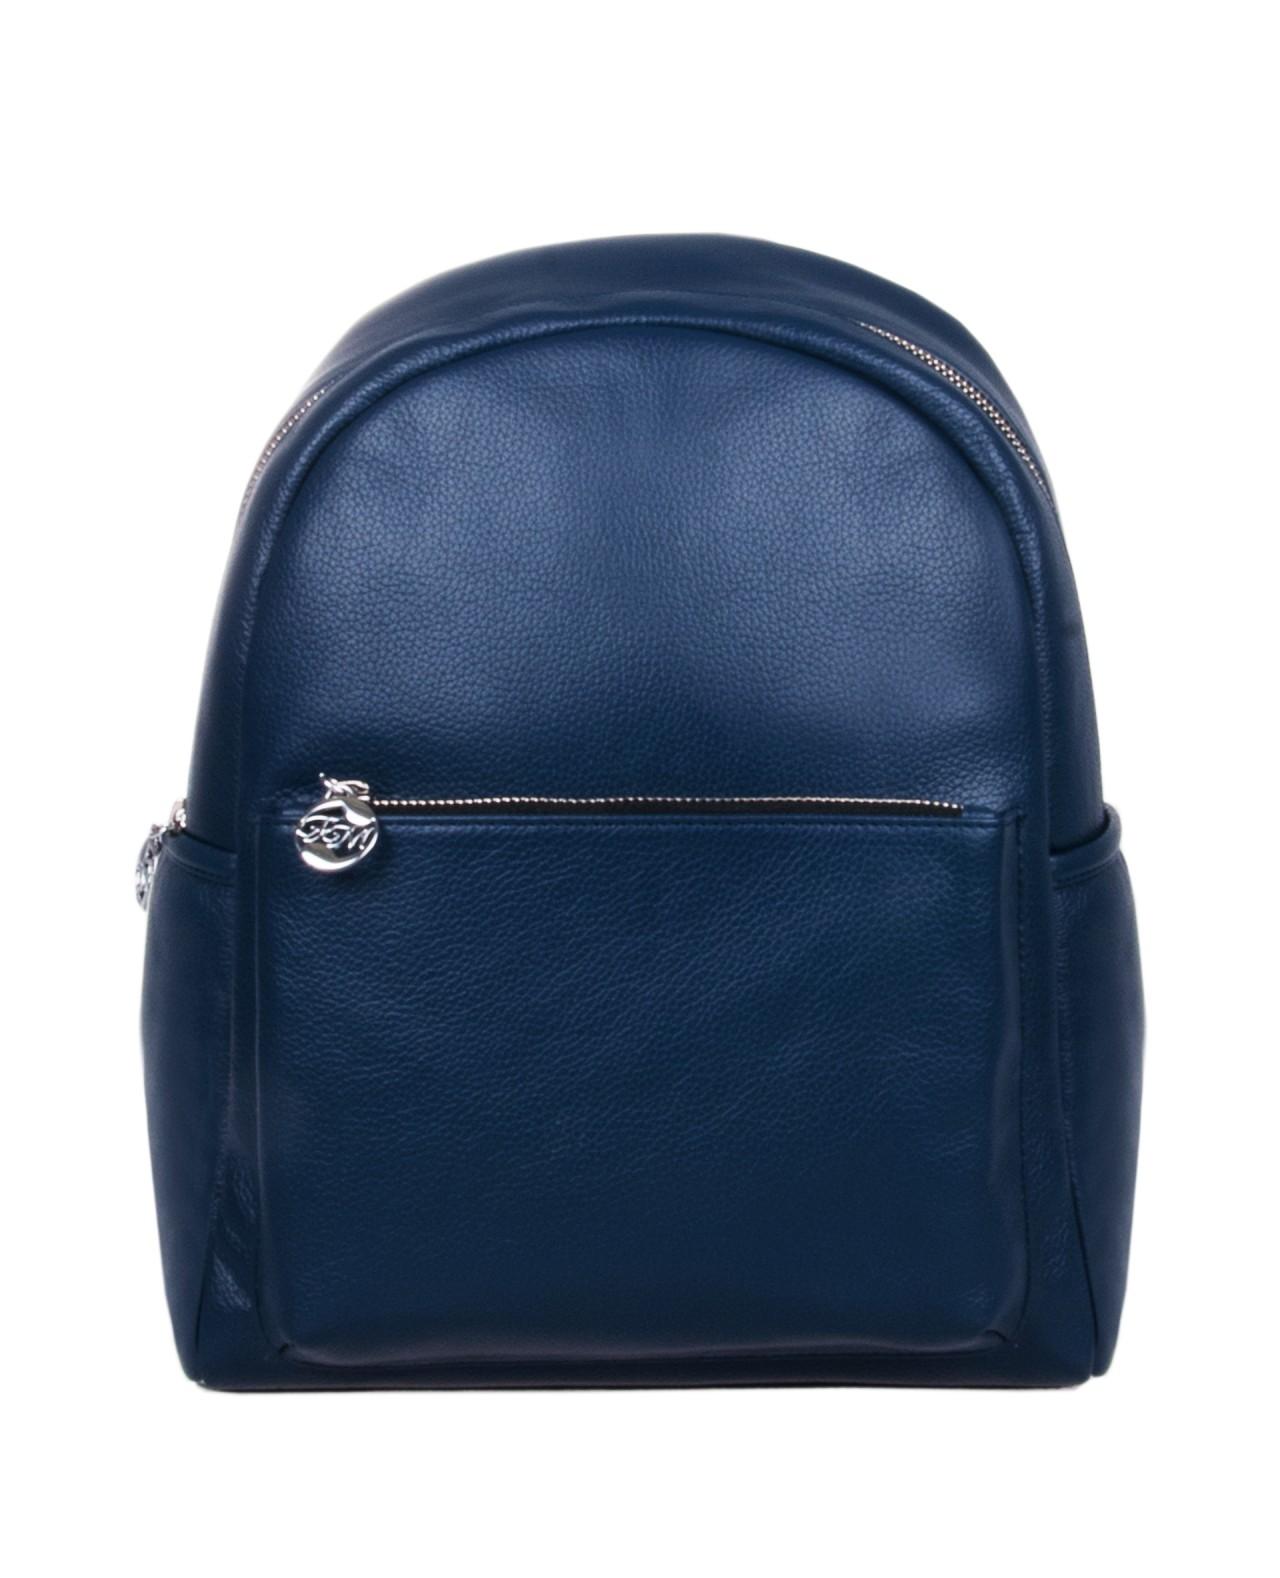 6ac7937c237d Рюкзак женский Franchesco Mariscotti 1-3906к пл синий